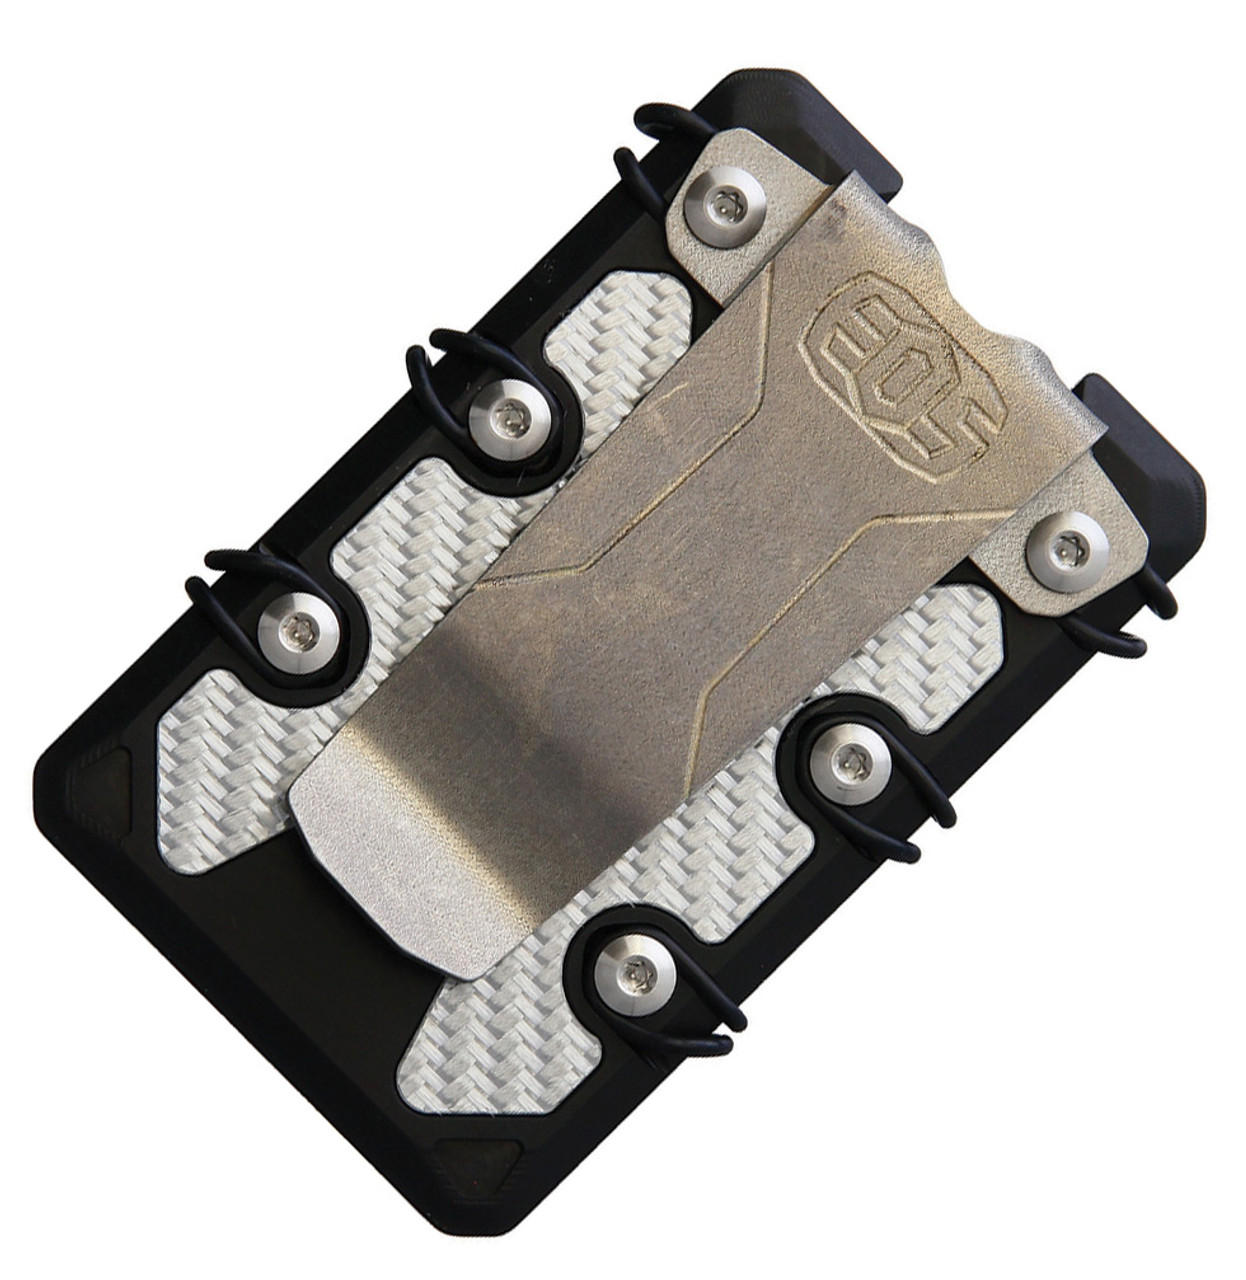 EOS 3.0 Lite Wallet EOS069, Aluminum Construction, Silver Anodized Hardware